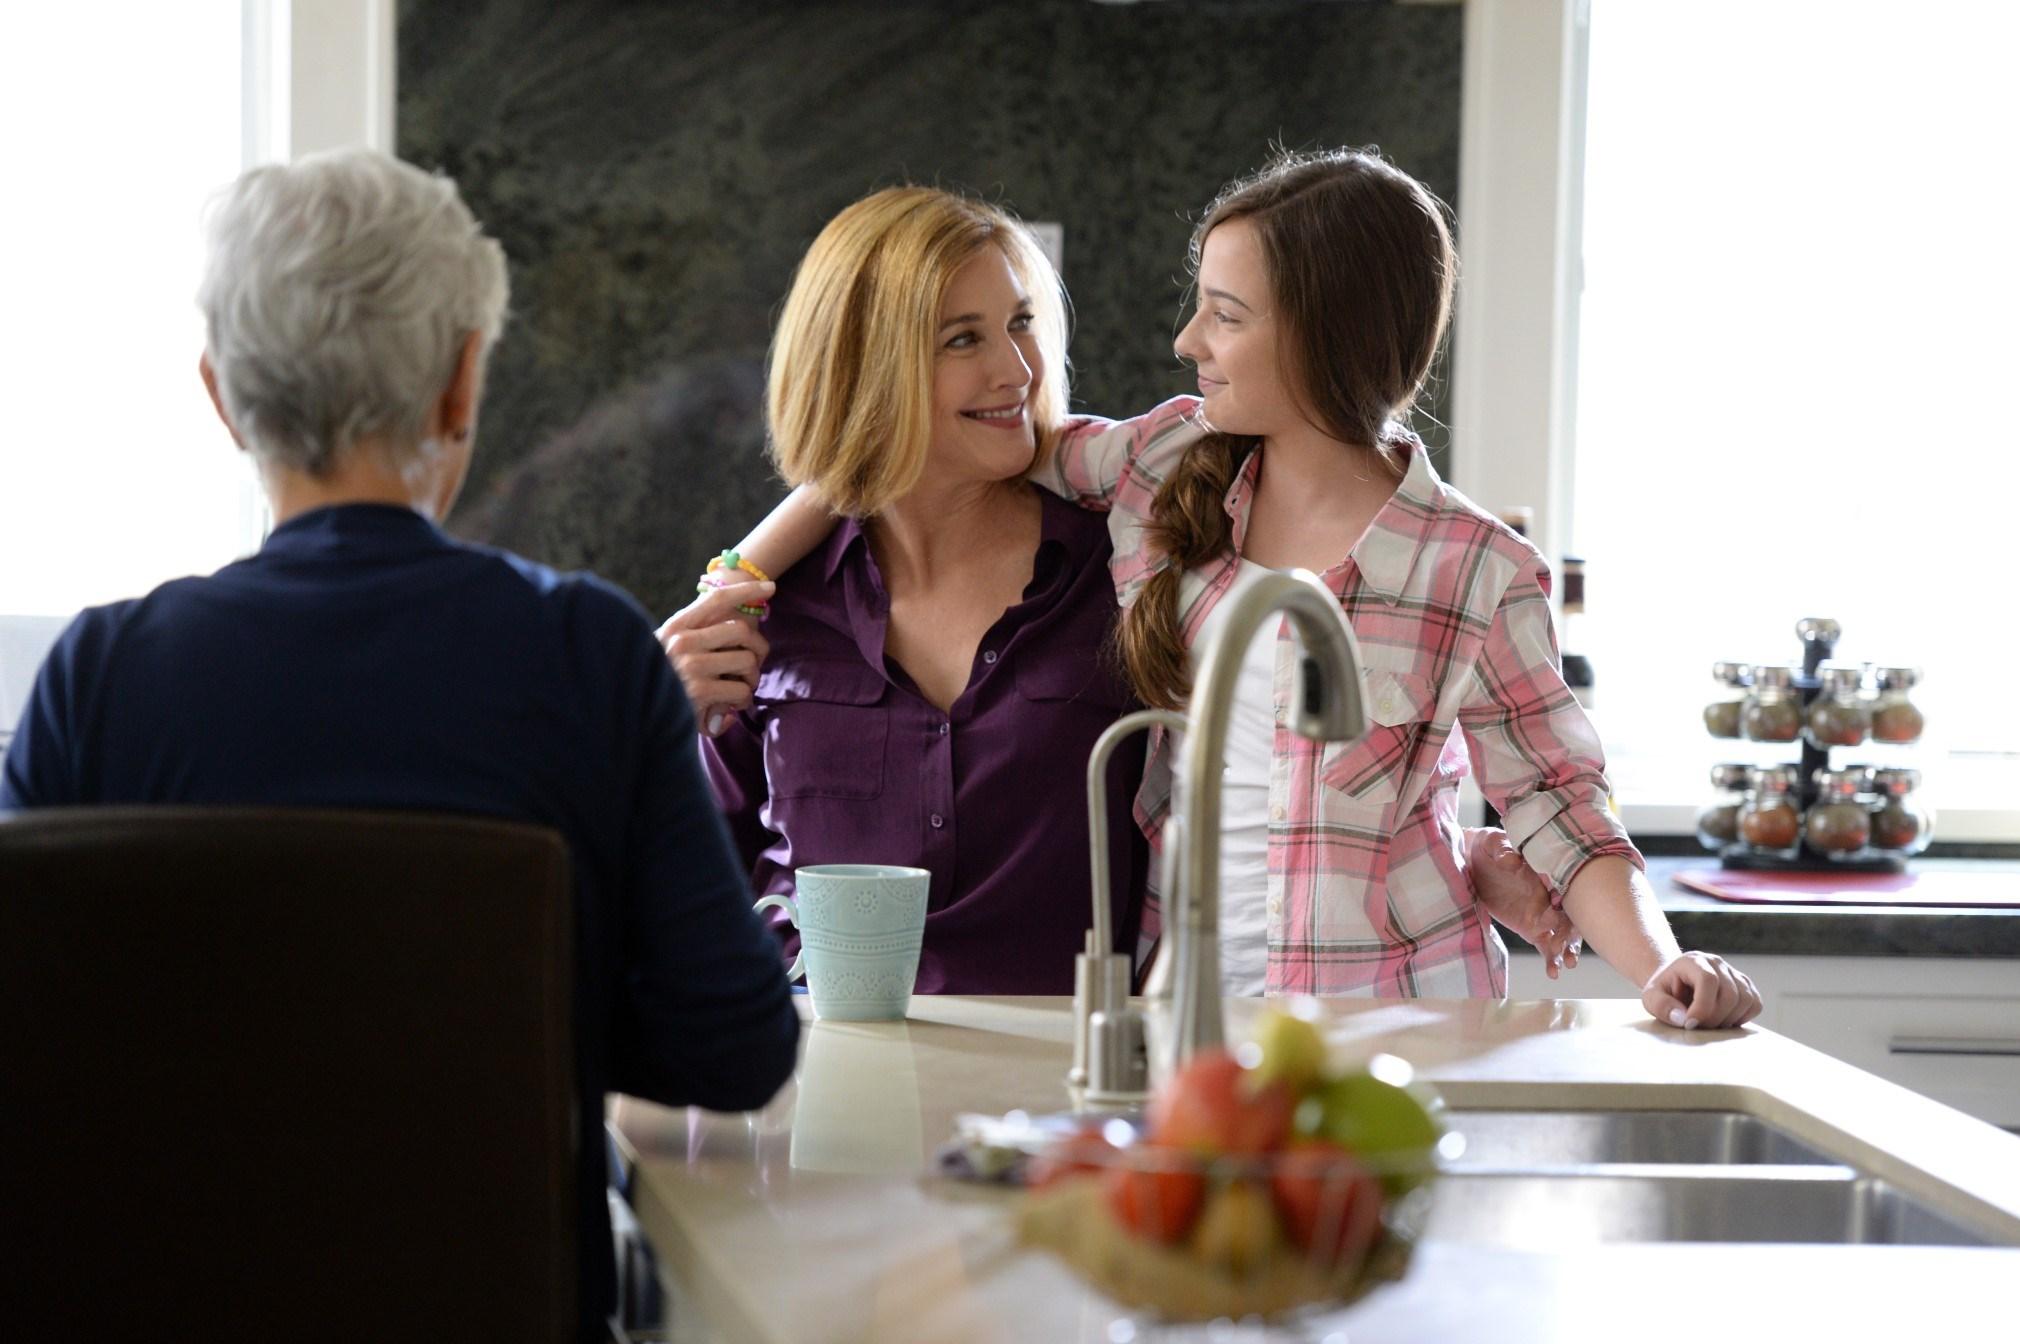 Pfizer brings humor to menopause marketing